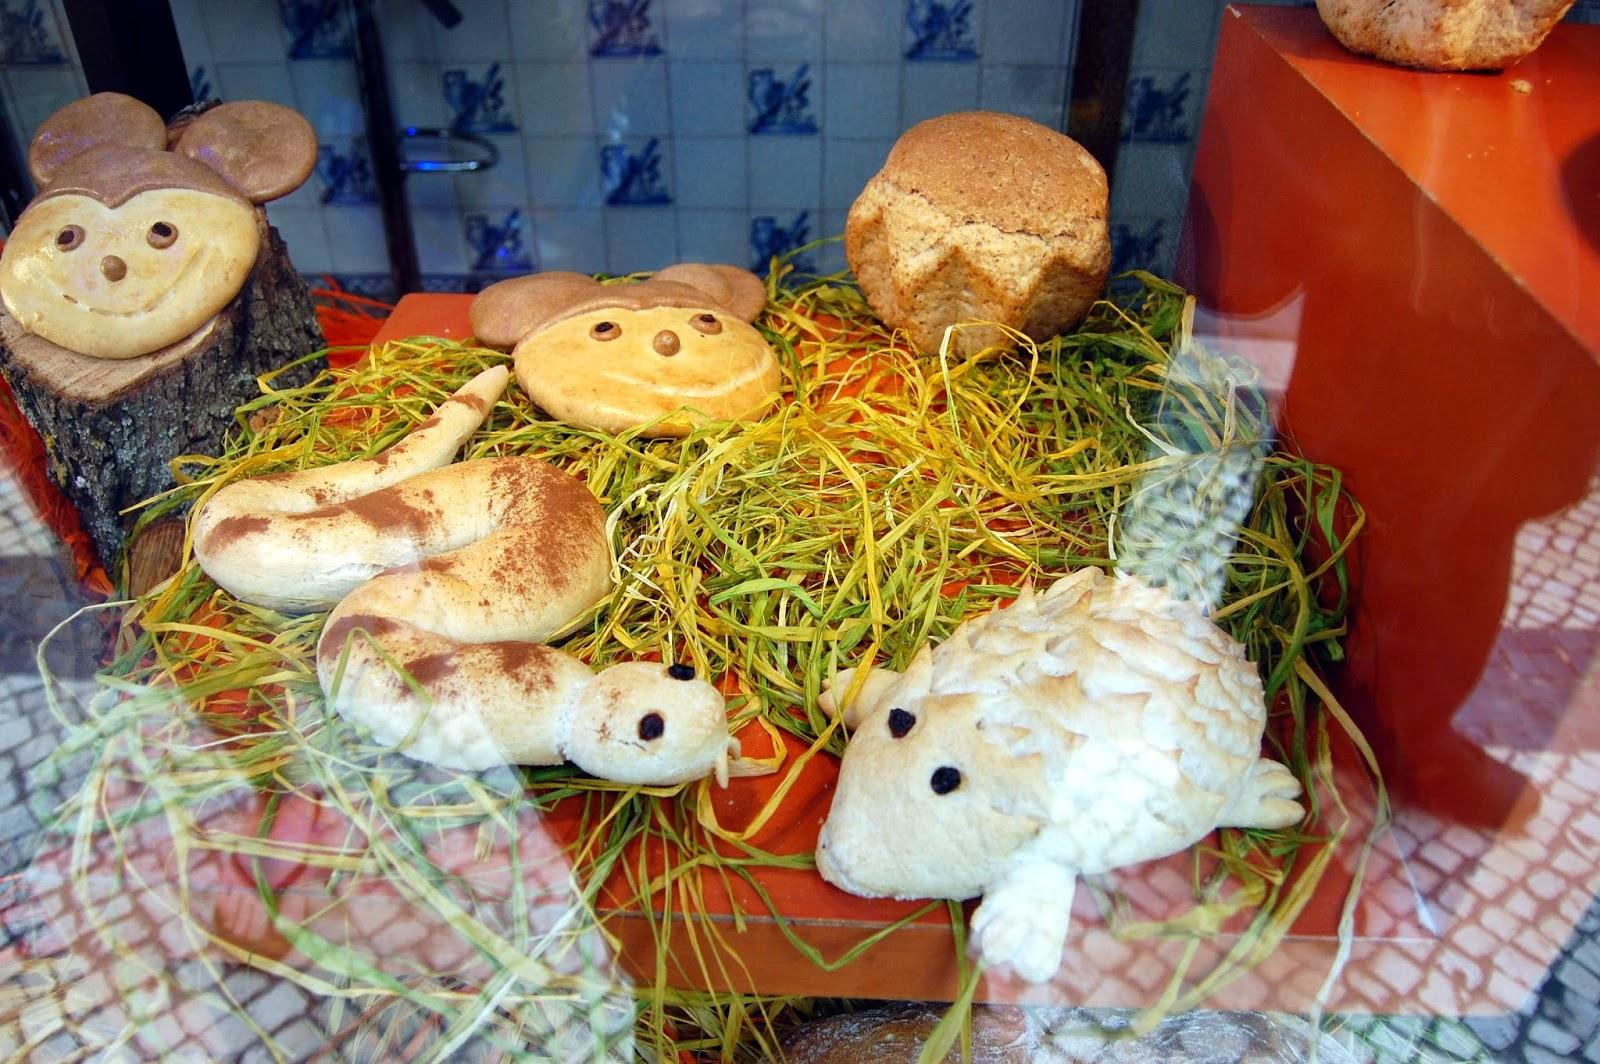 Stitch & Bear - Eat Drink Walk Petiscos Lisbon - Bread animals